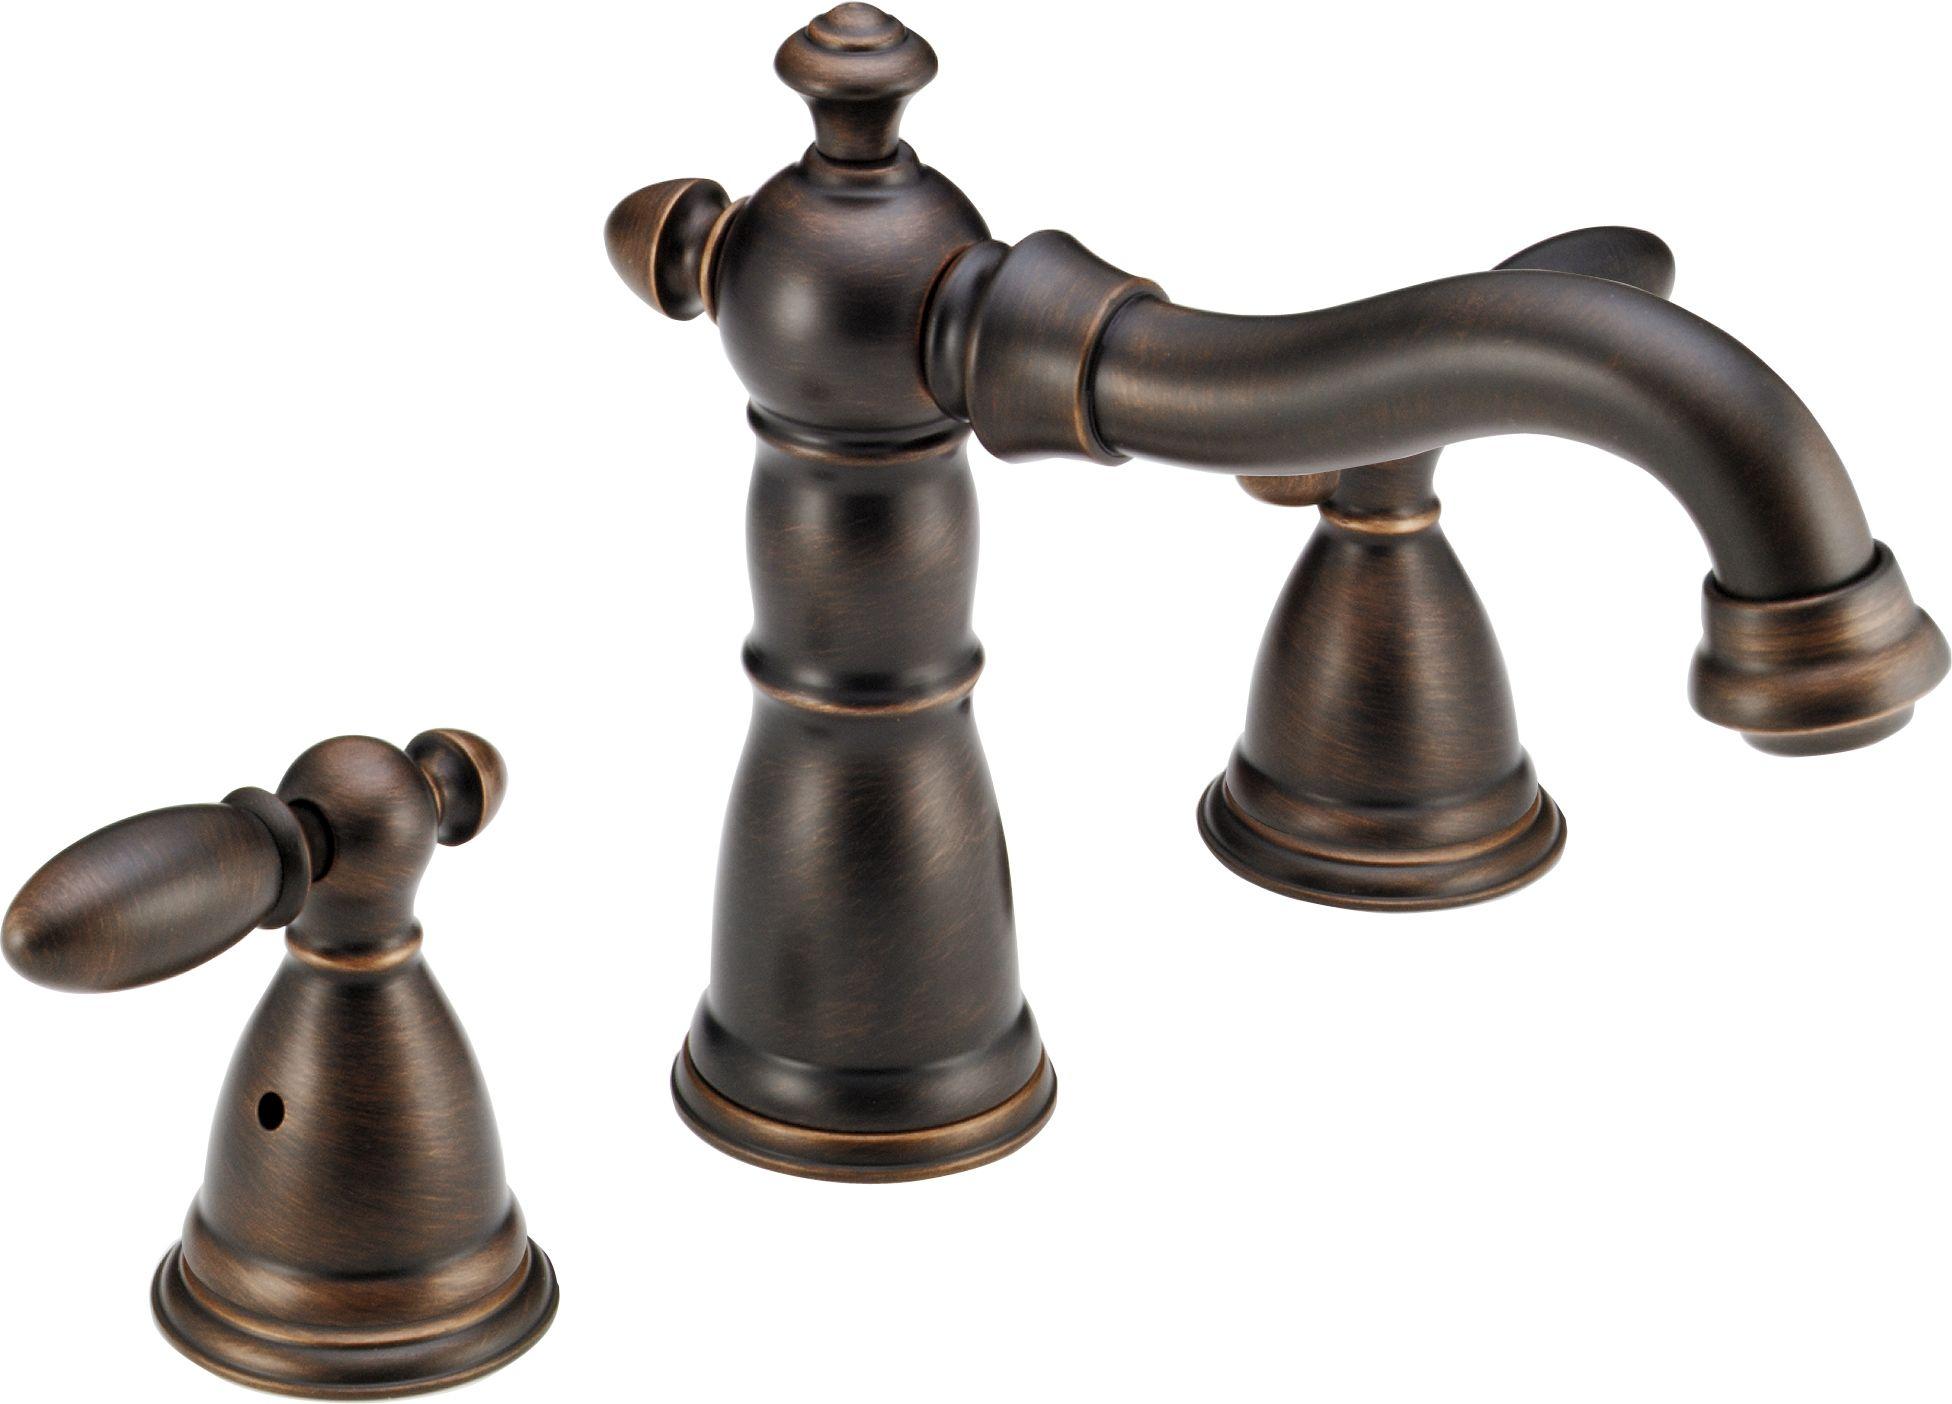 ea68f064ddd Delta venetian bronze victorian double handle roman tub trim with lever  handles rough in valve included